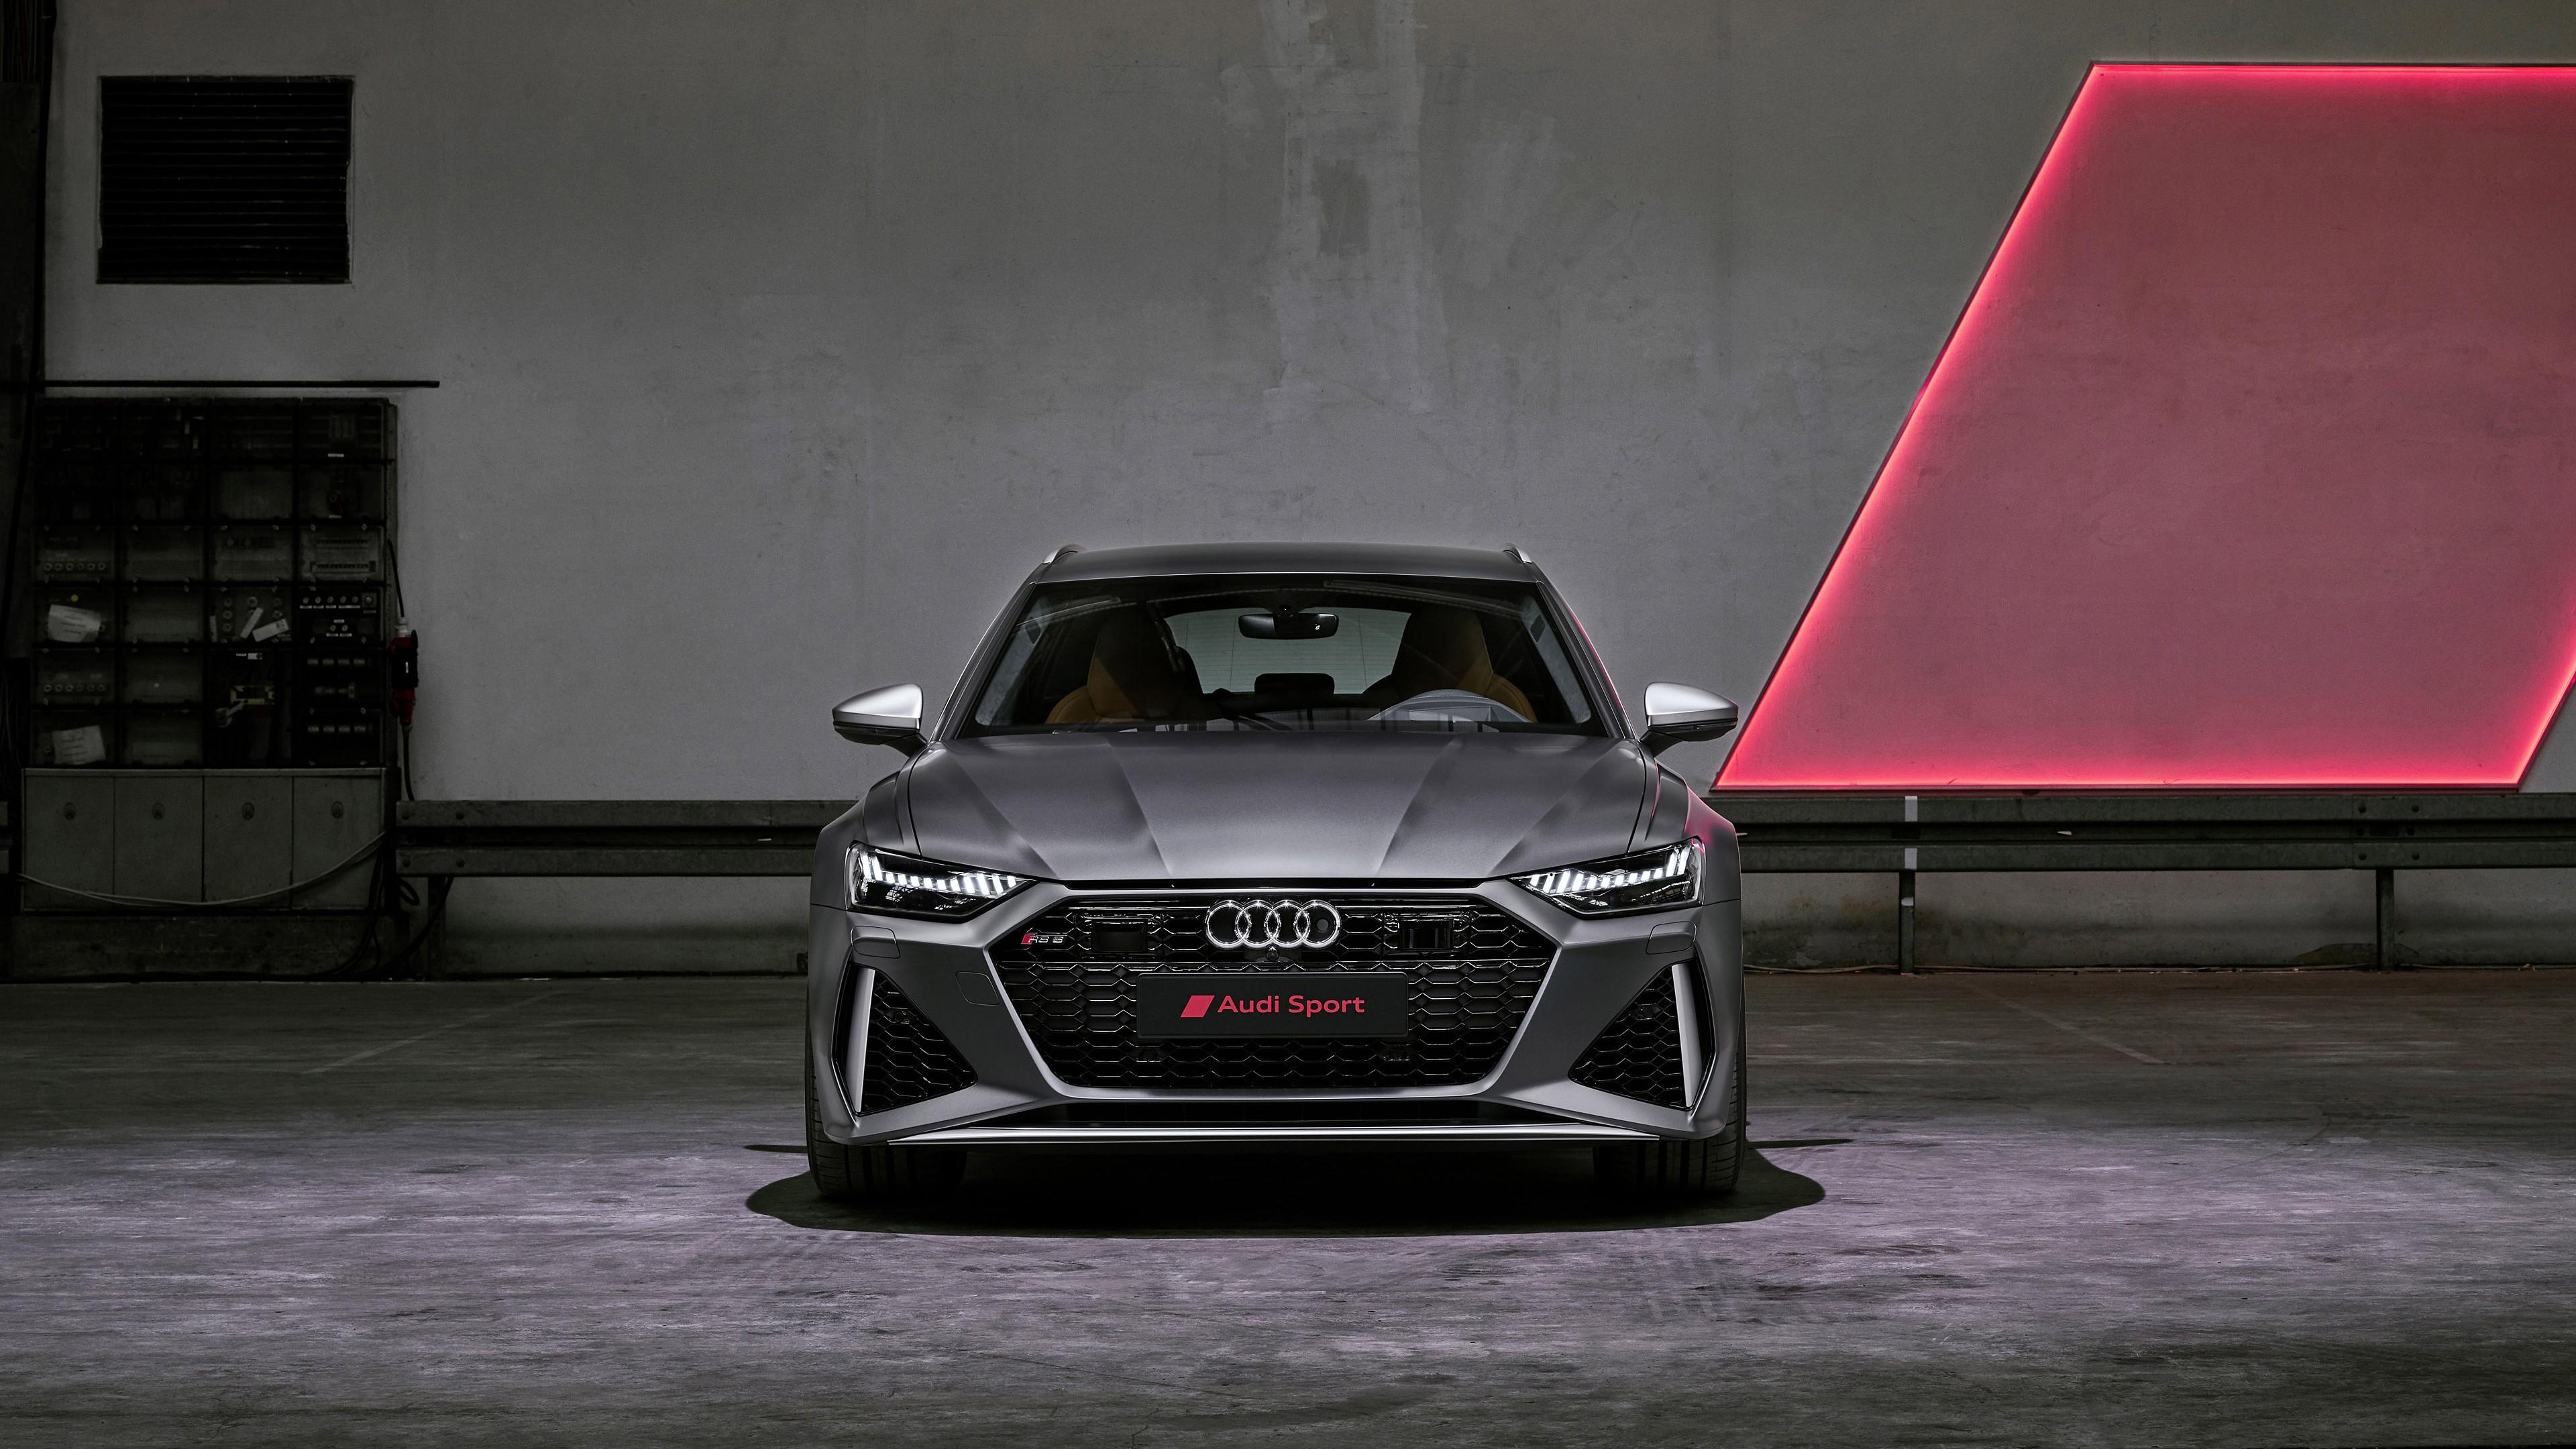 Tron Iphone X Wallpaper 2020 Audi Rs6 Avant 4k 2 Wallpaper Hd Car Wallpapers